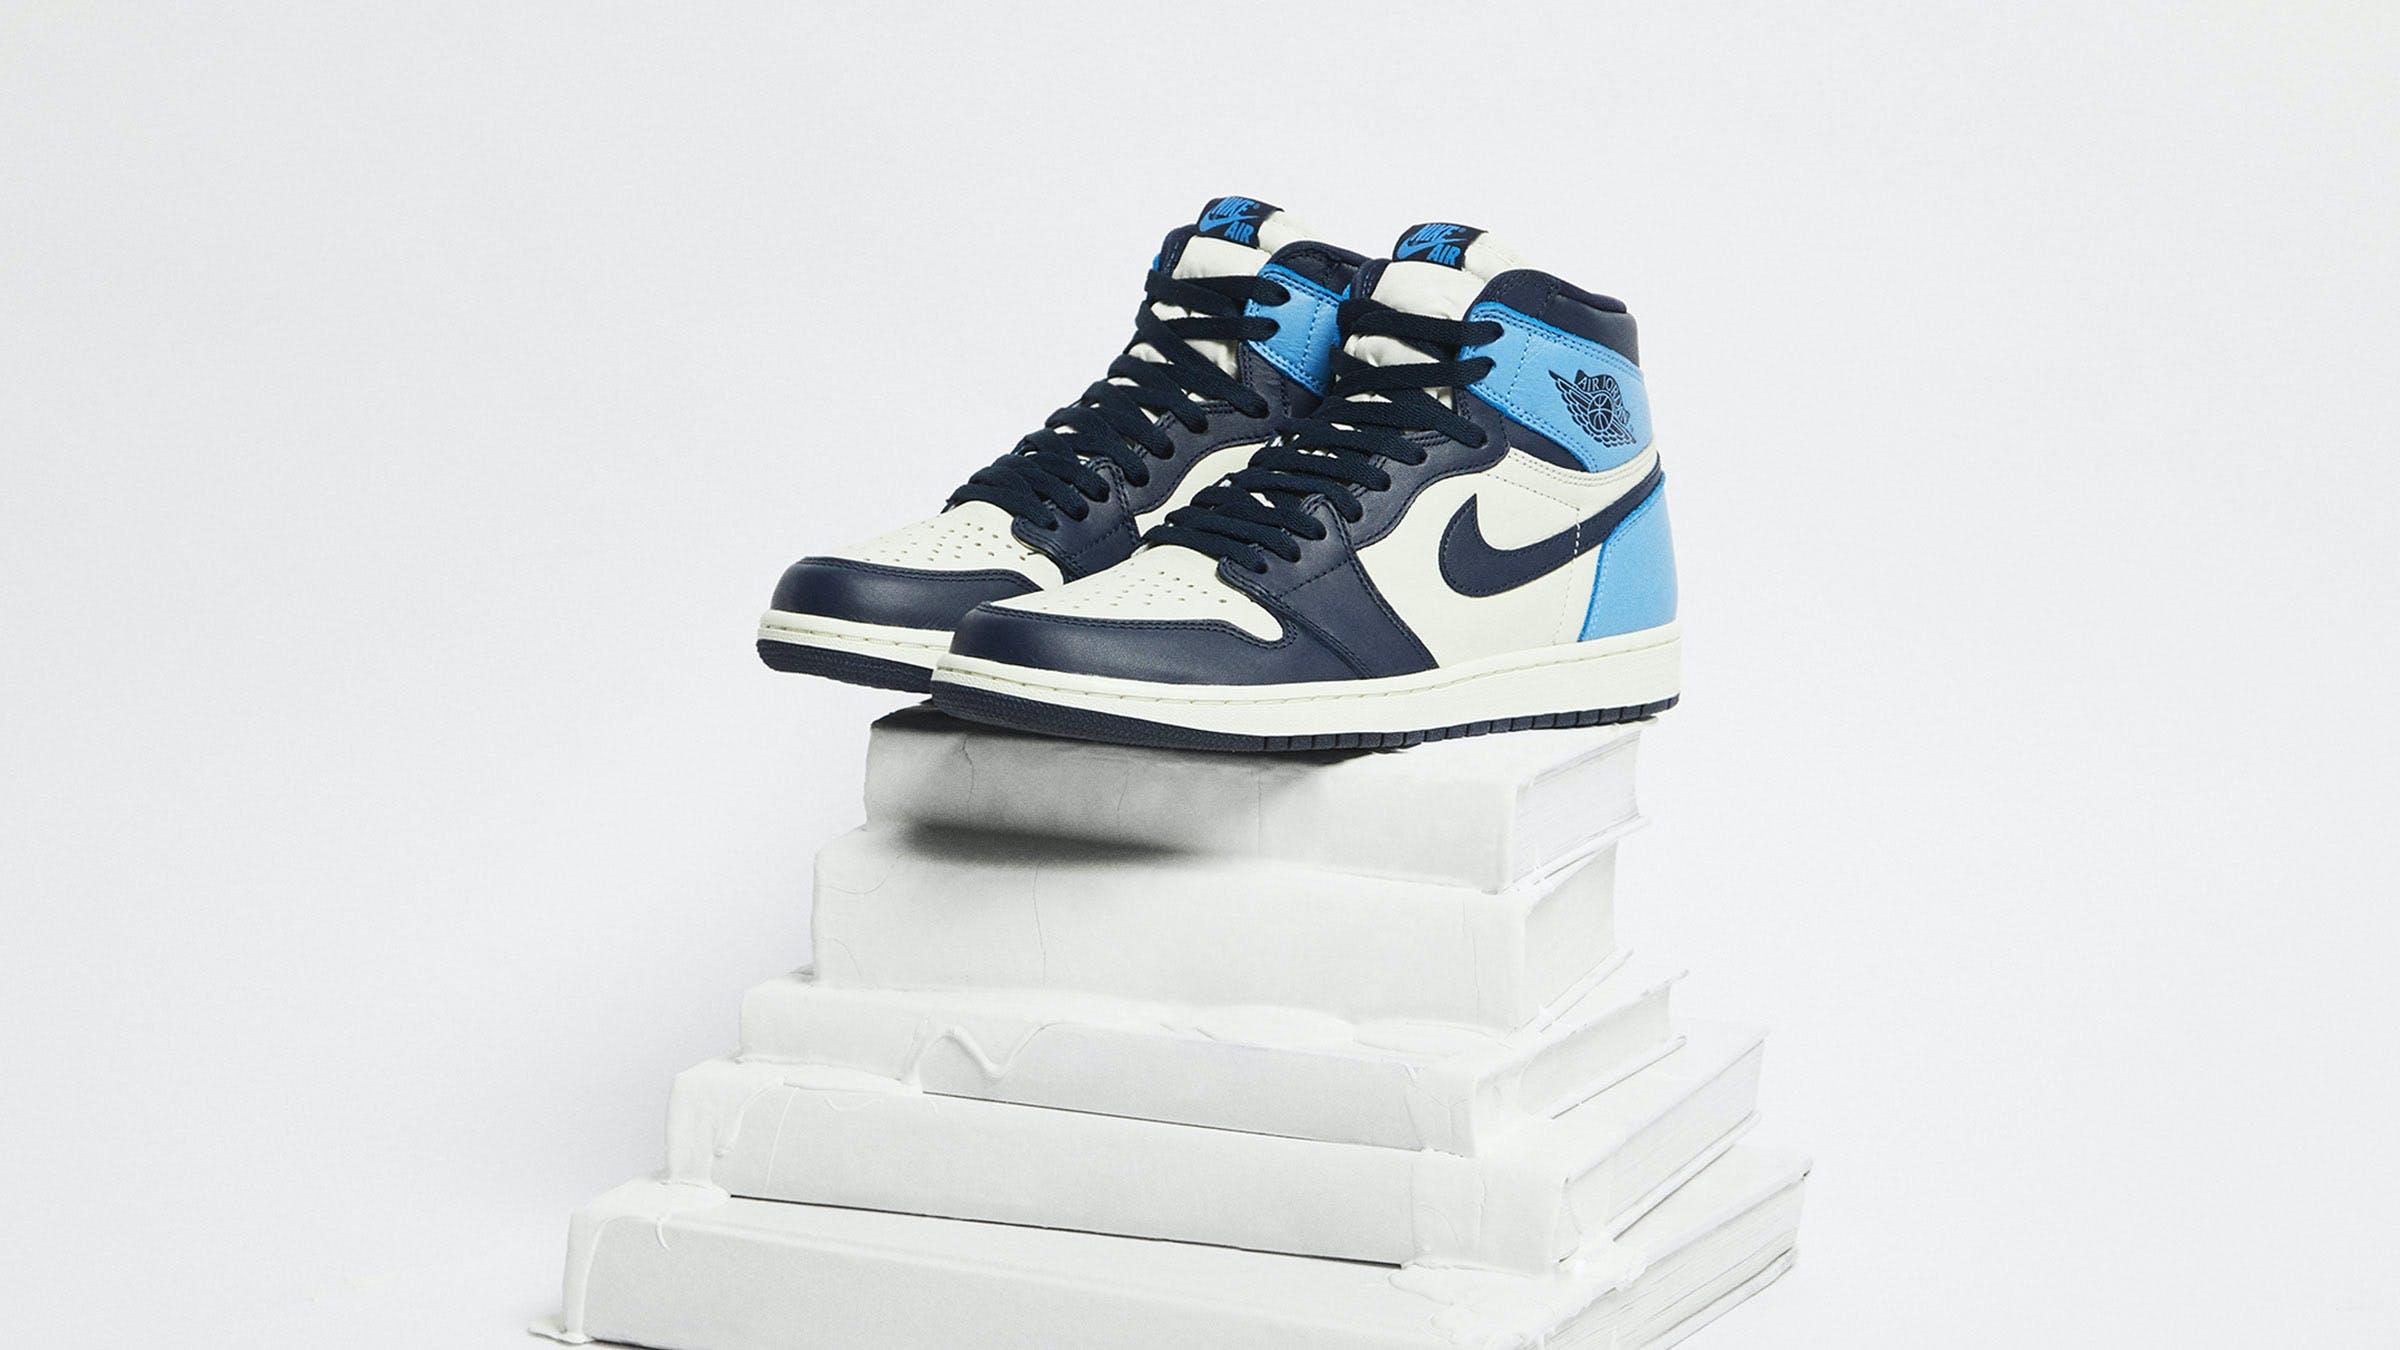 End Features Nike Air Jordan 1 Obsidian Unc Register Now On